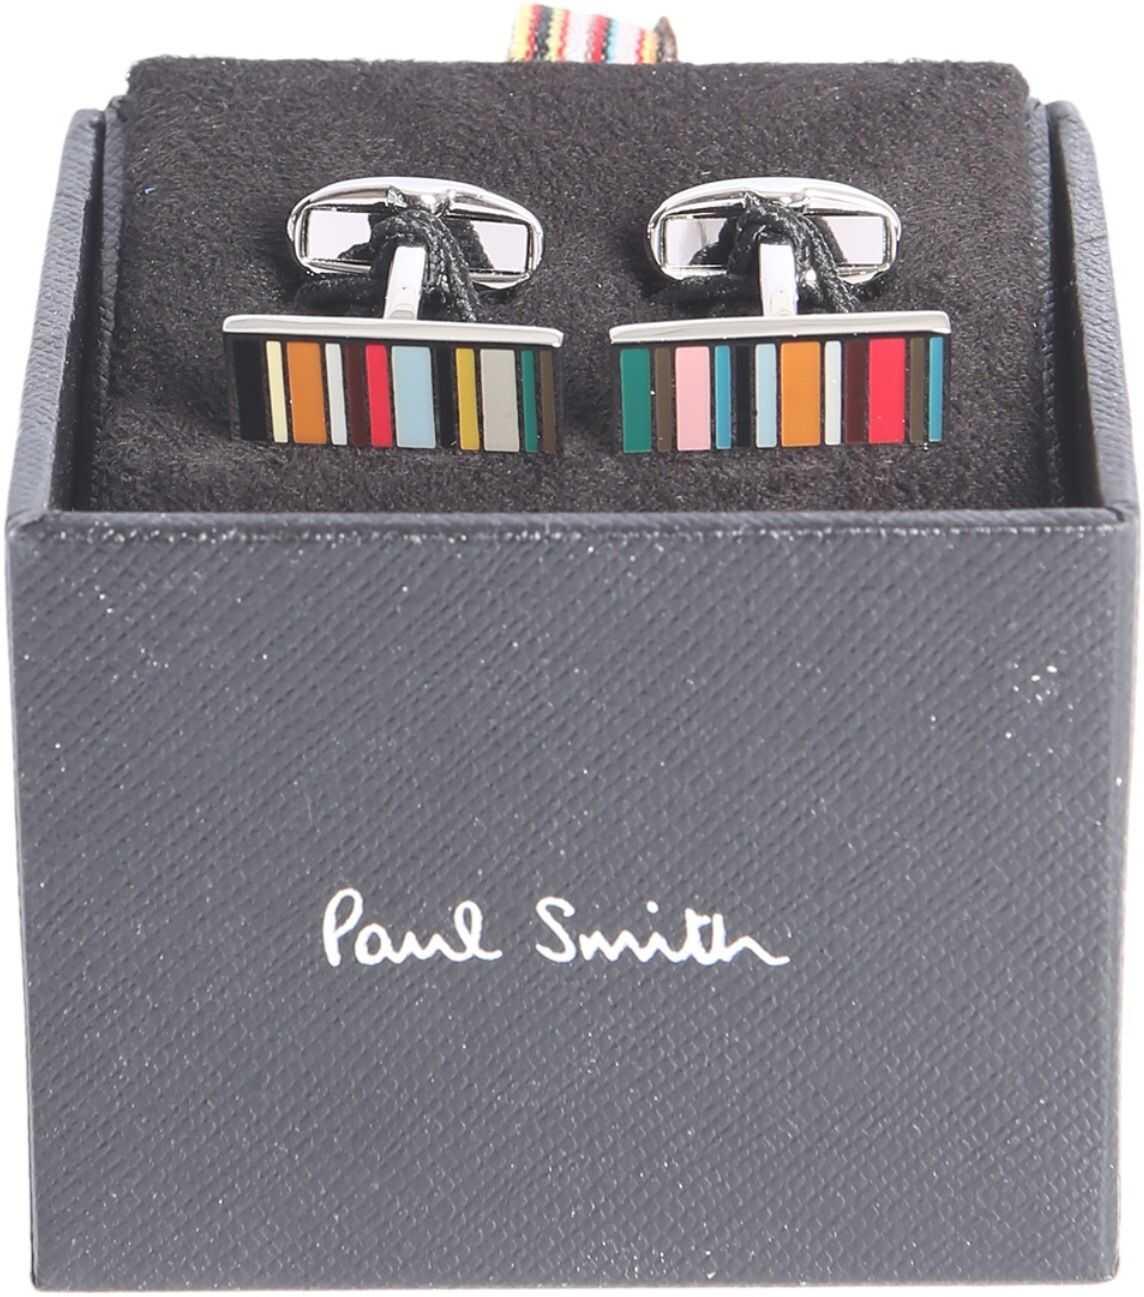 Paul Smith Striped Cufflinks MULTICOLOUR